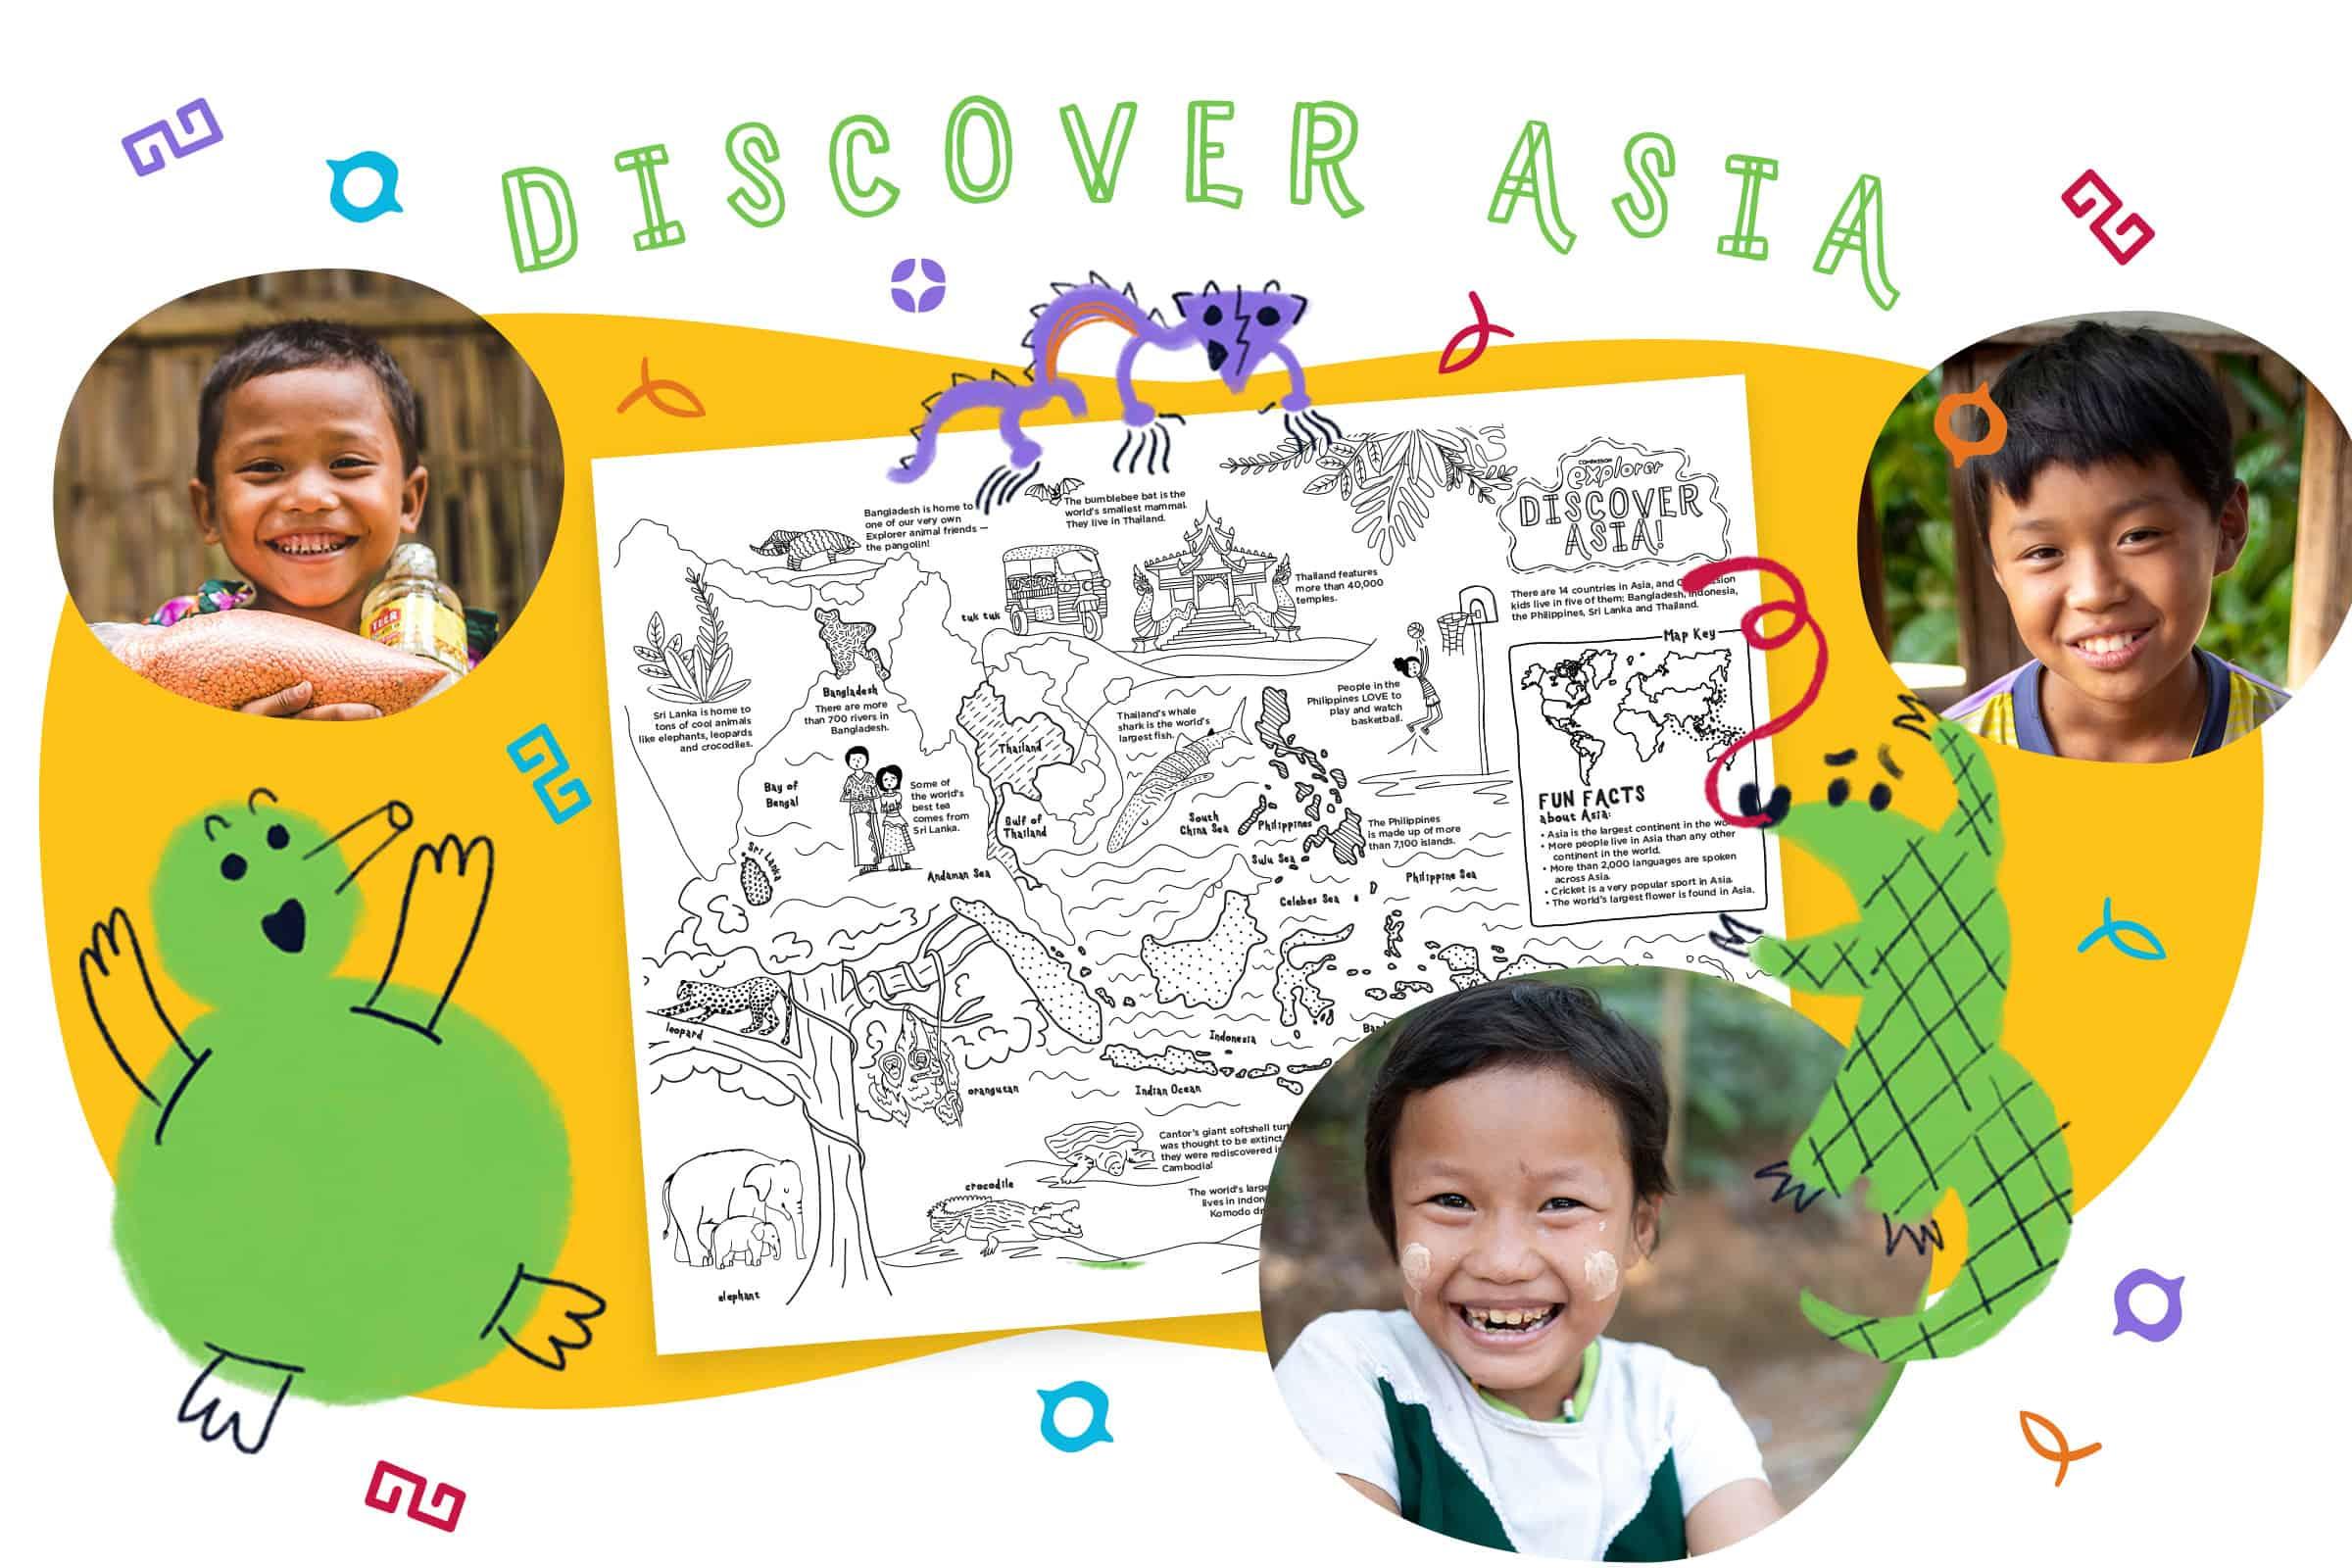 DiscoverAsia-banner